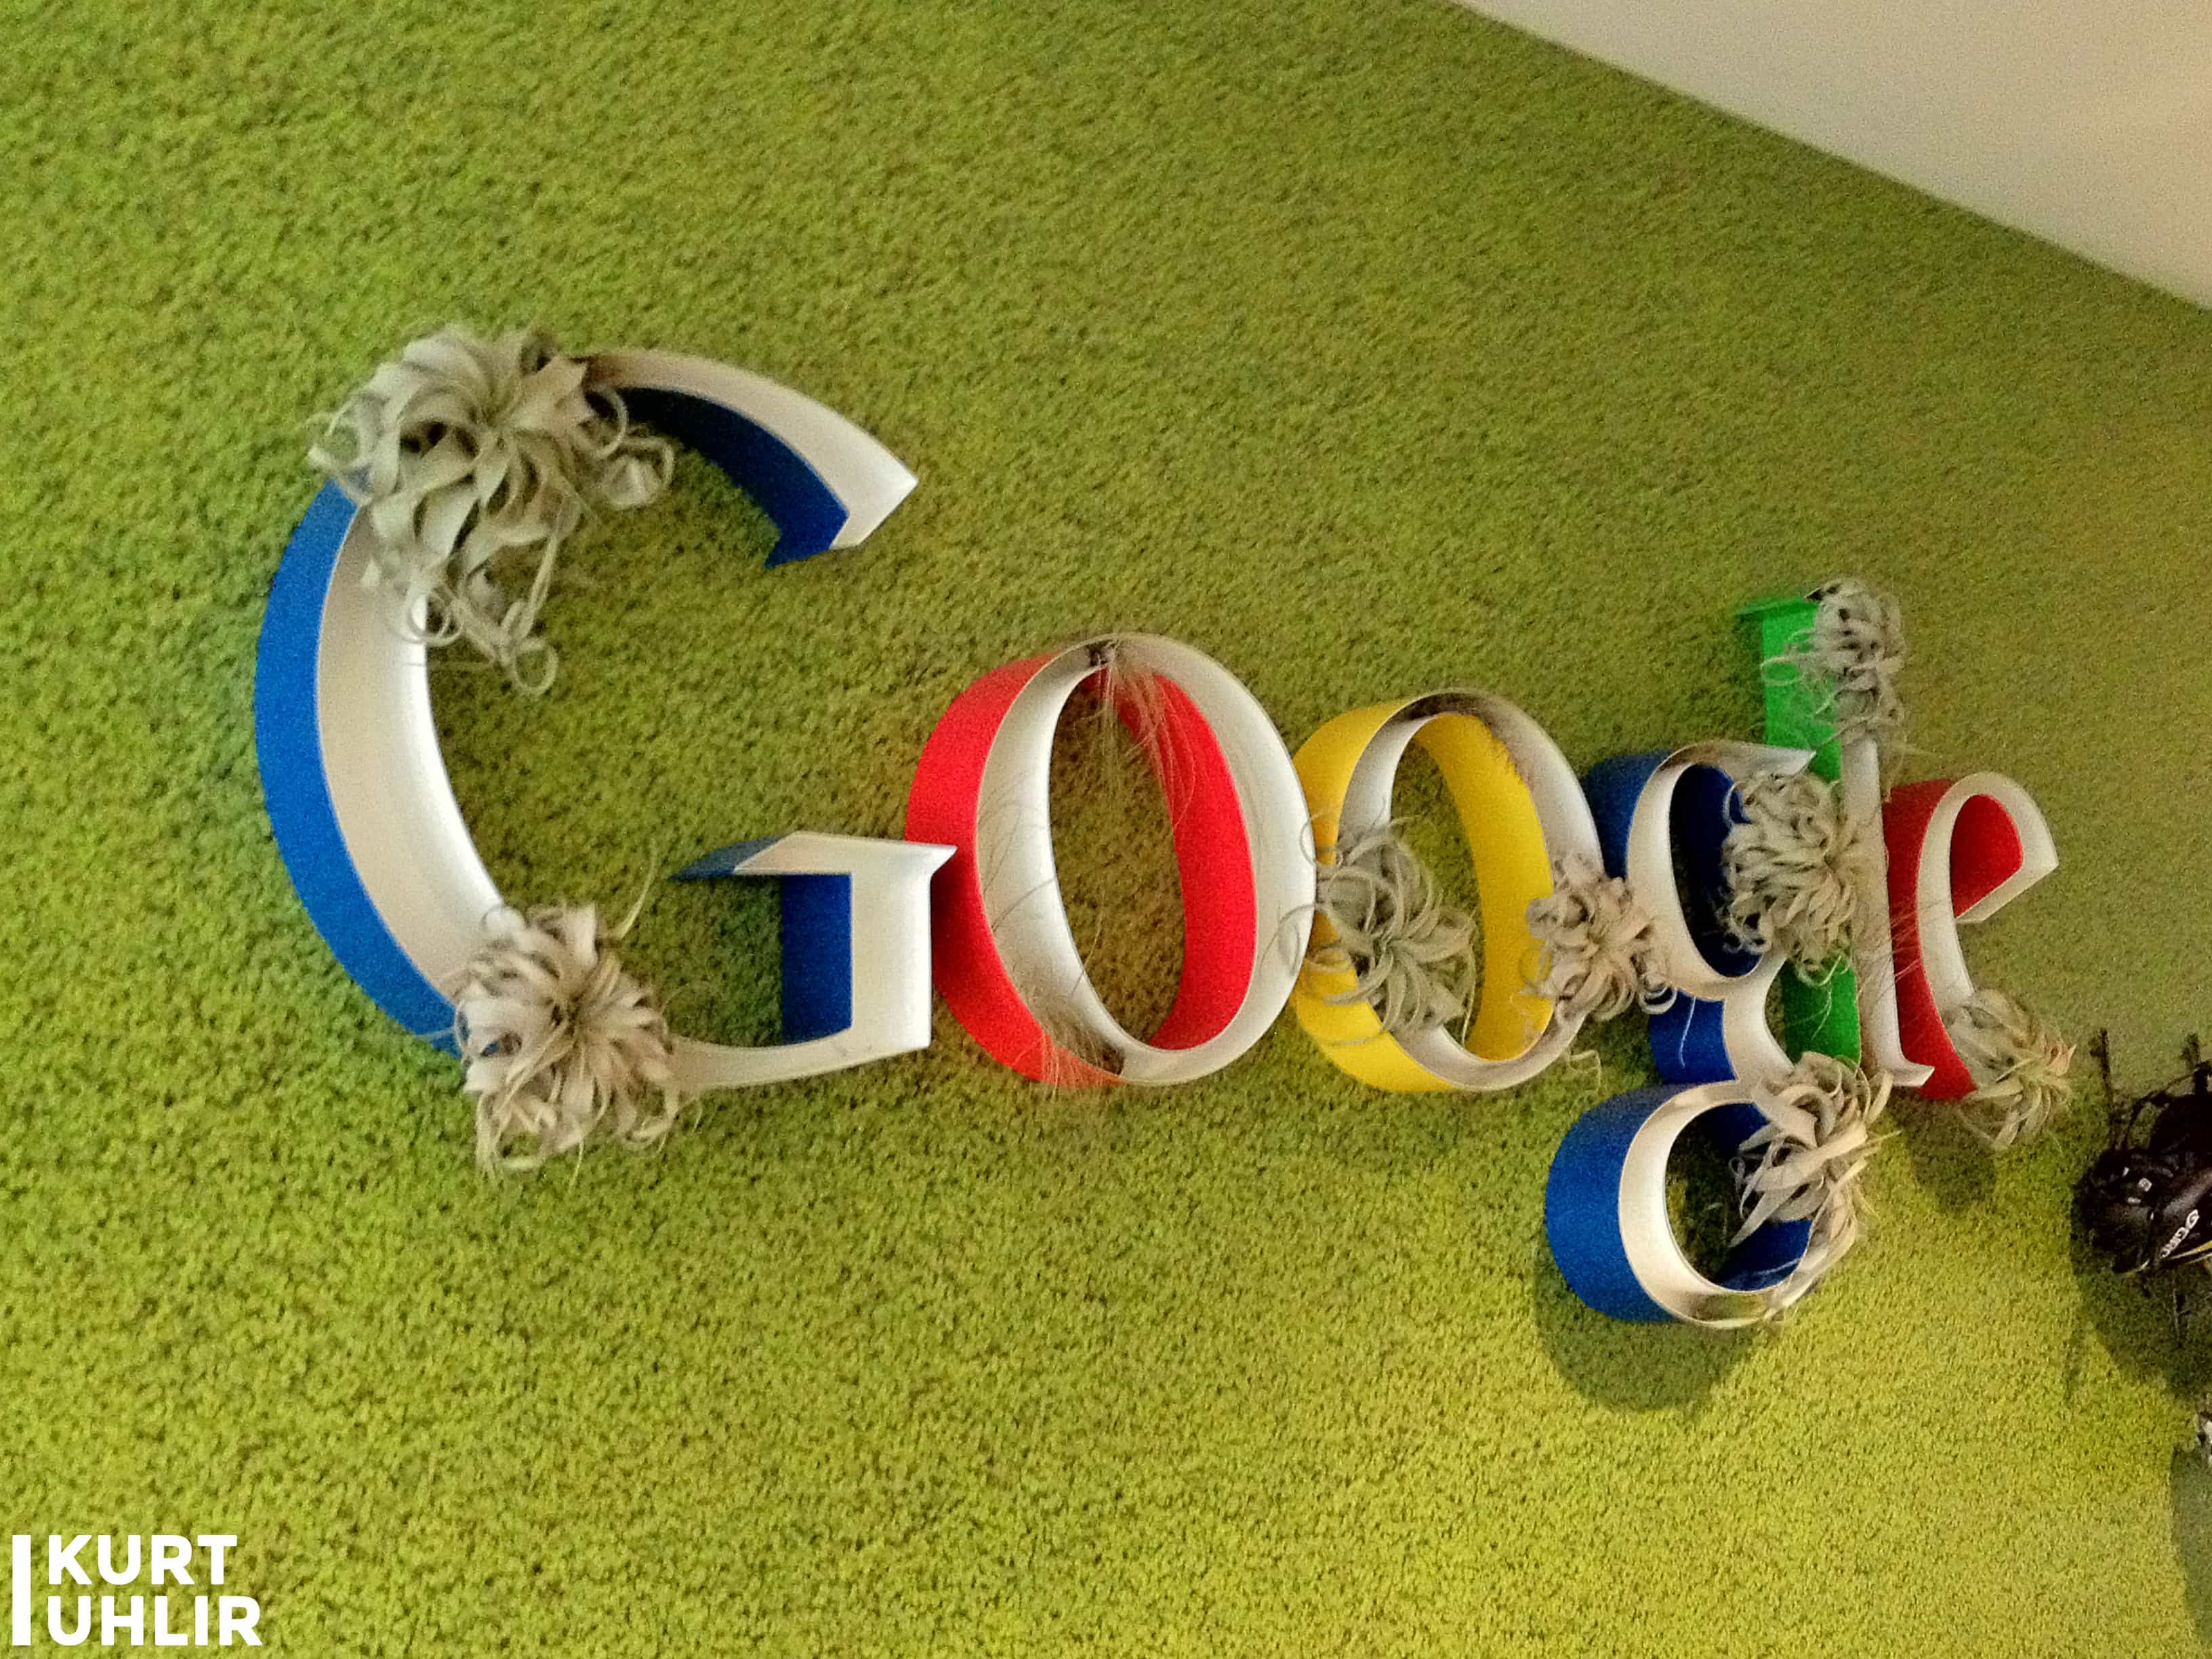 Kurt Uhlir - more meetings at Google's Headquarters